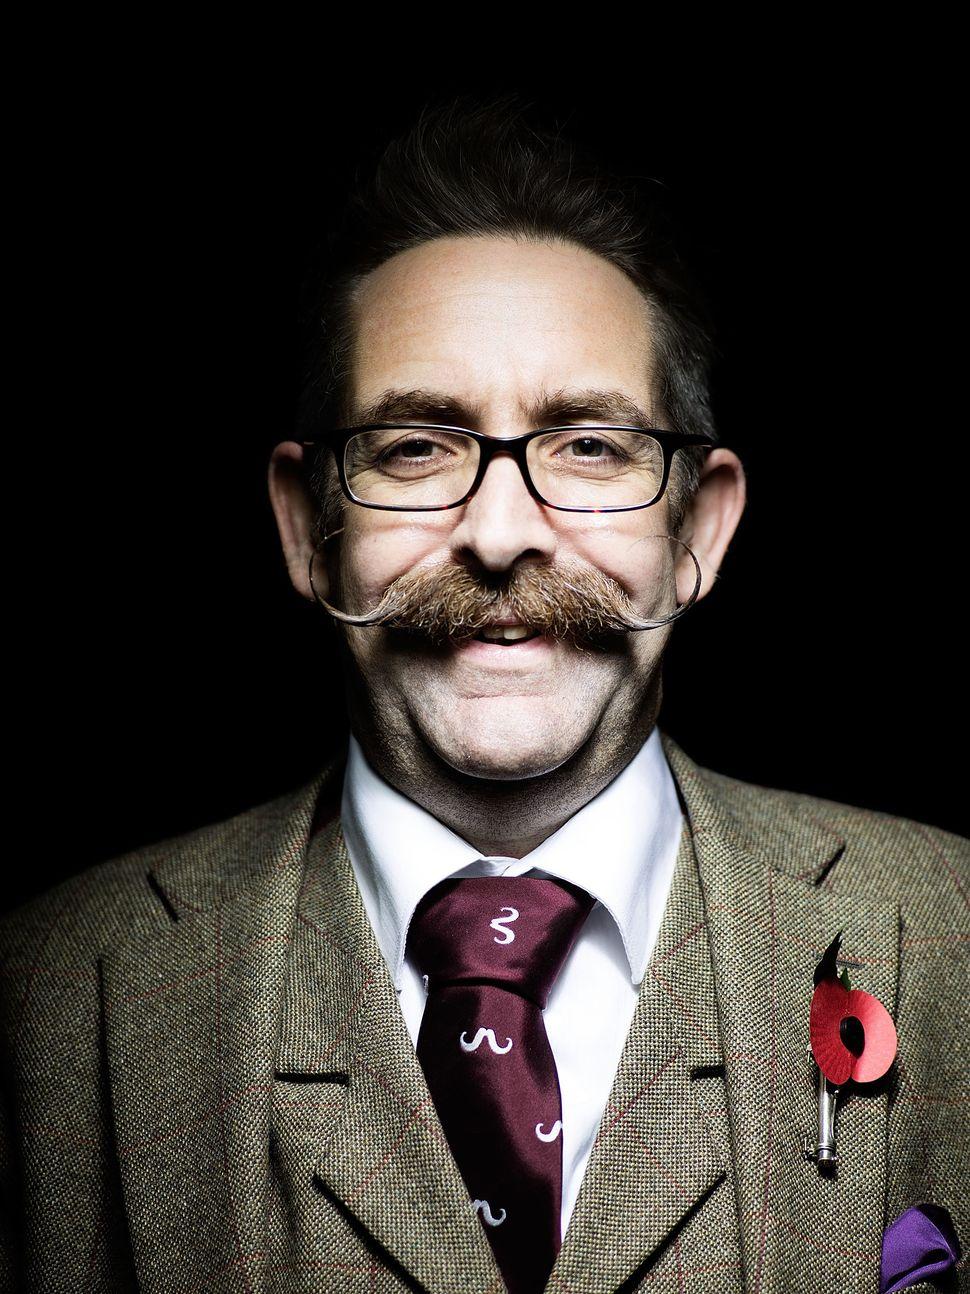 Handlebar Club member Allan Robinson, sporting a classic handlebar moustache.